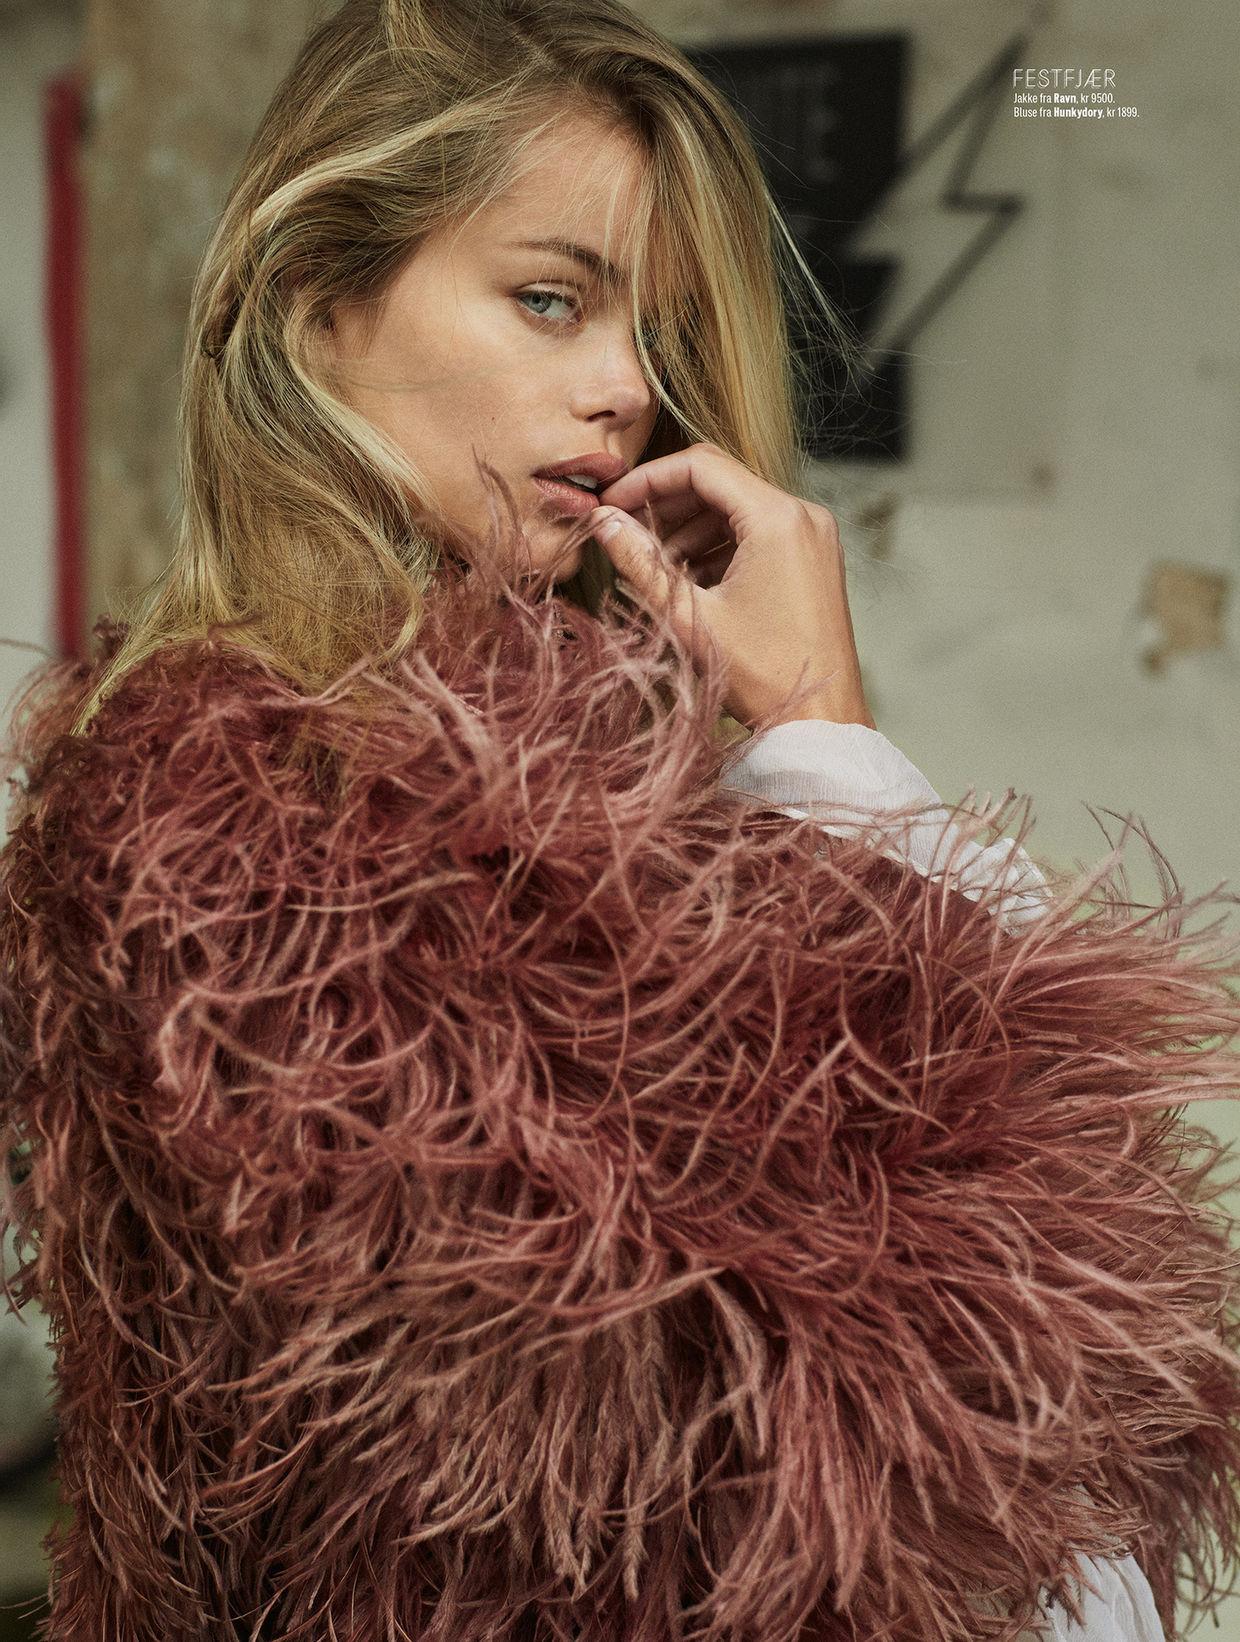 KRISTINA KORB GMBH, Asa Tallgard, Elle, Frida Aasen, Fashion, Editorial